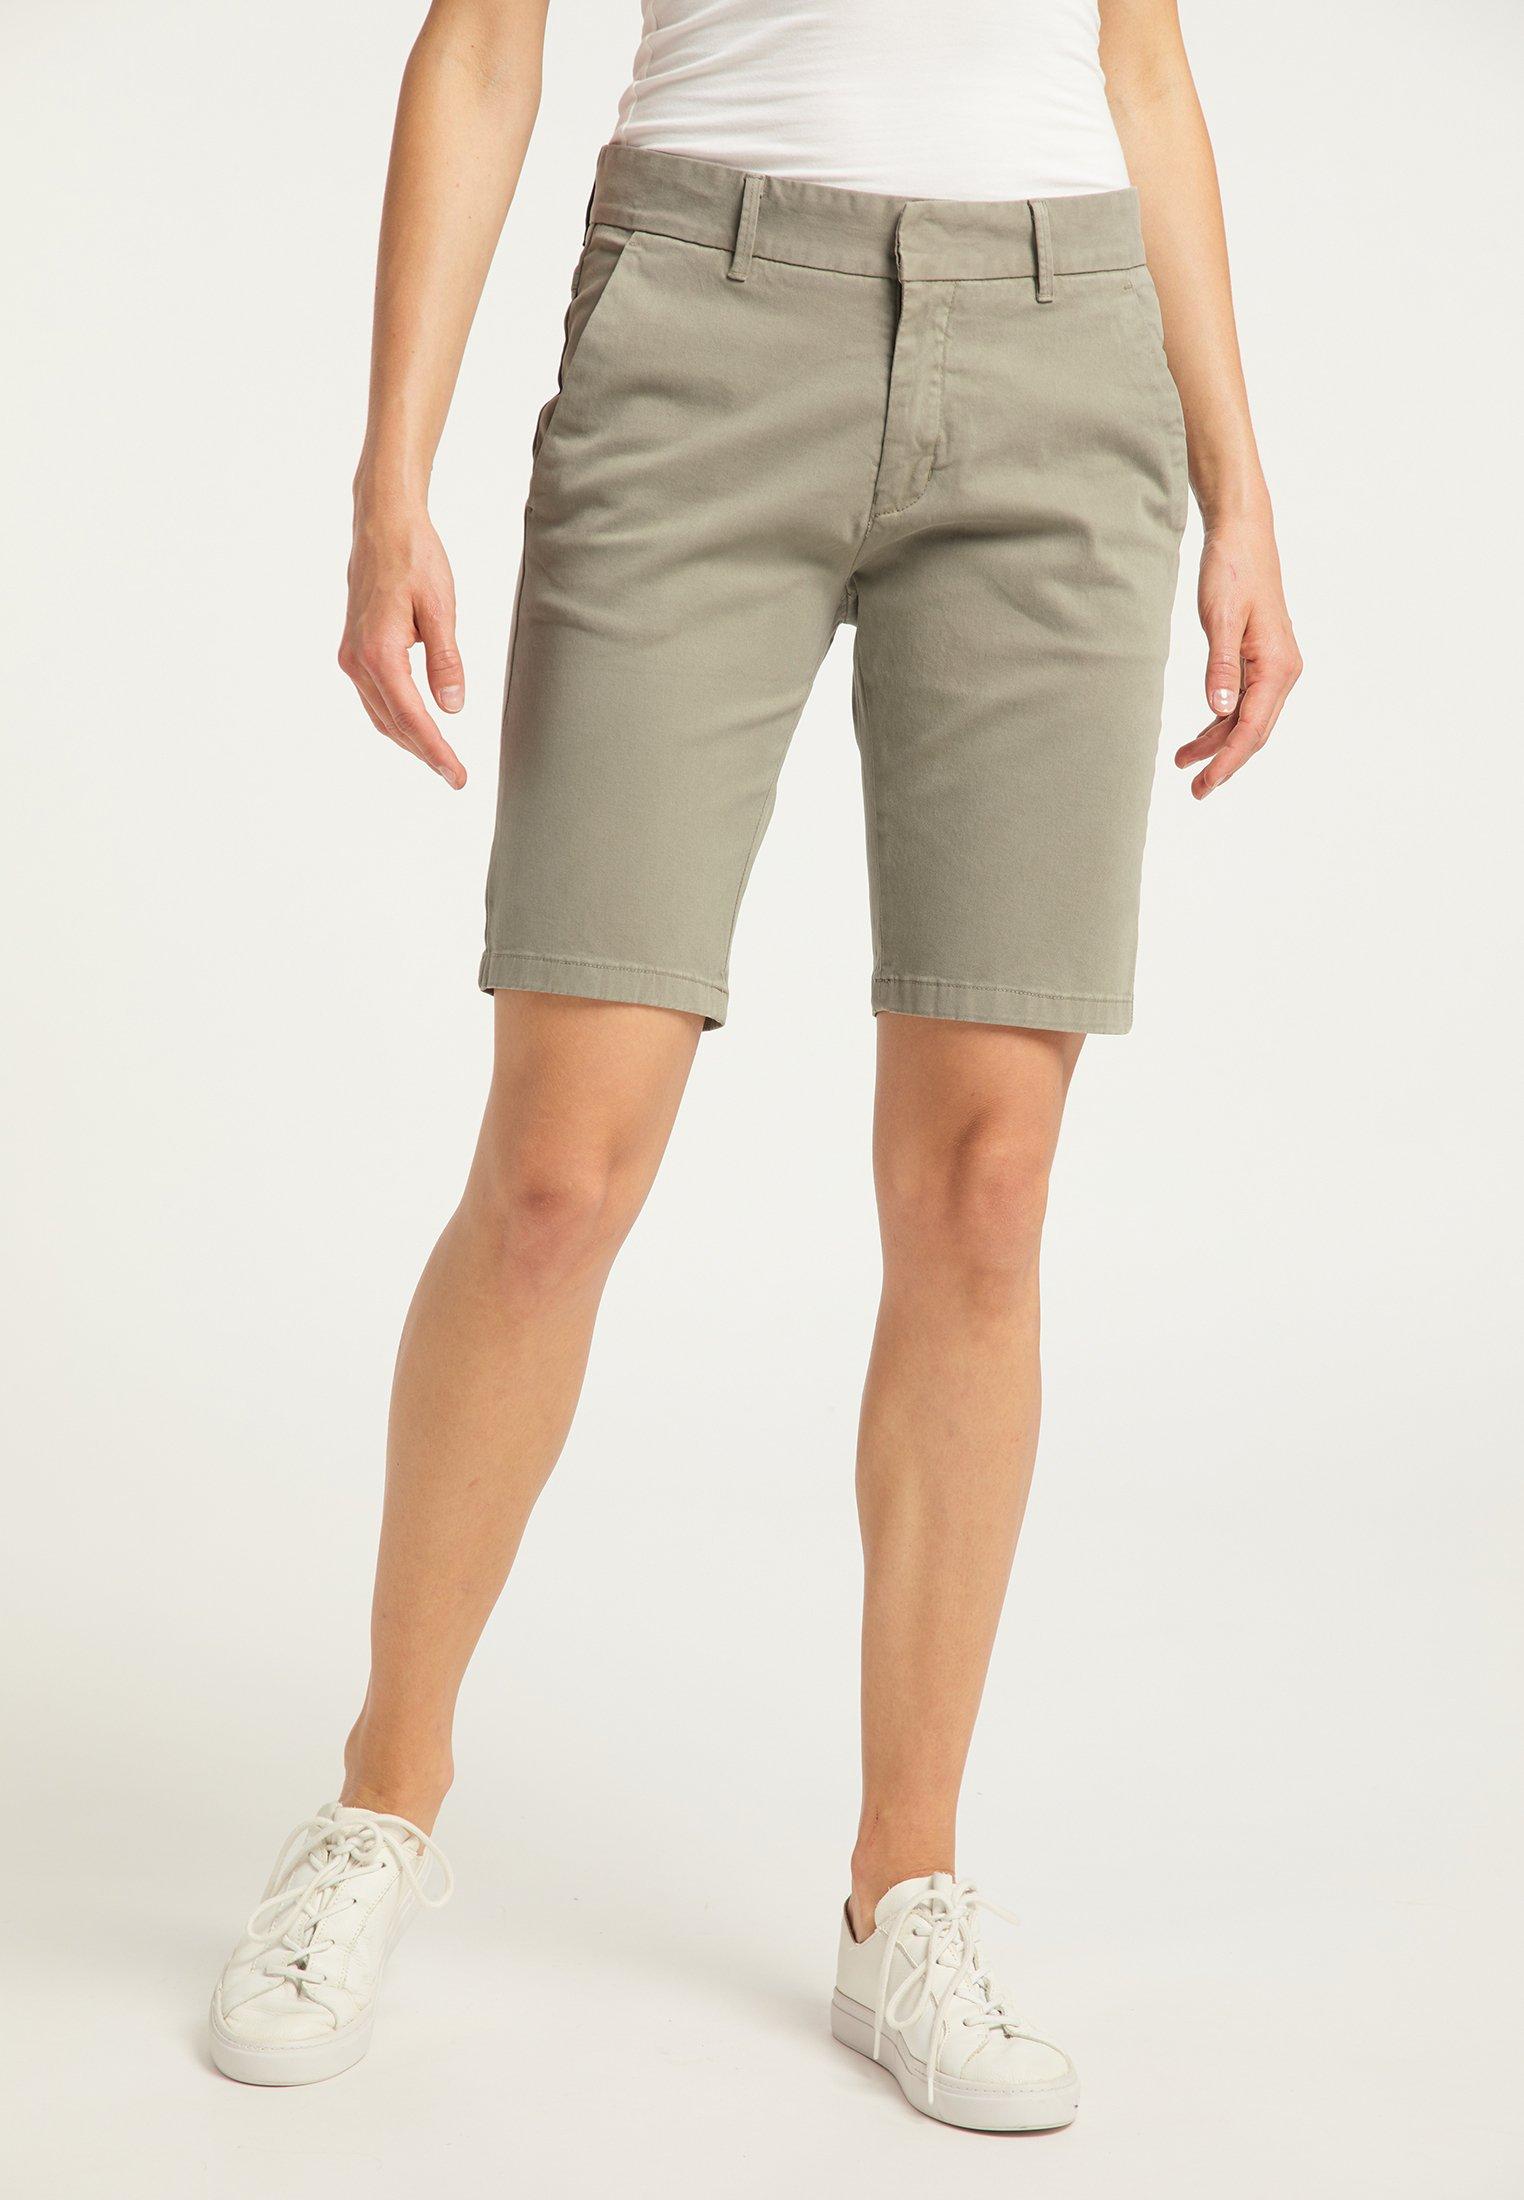 Discounts Women's Clothing DreiMaster Shorts khaki p5lO6sgAd